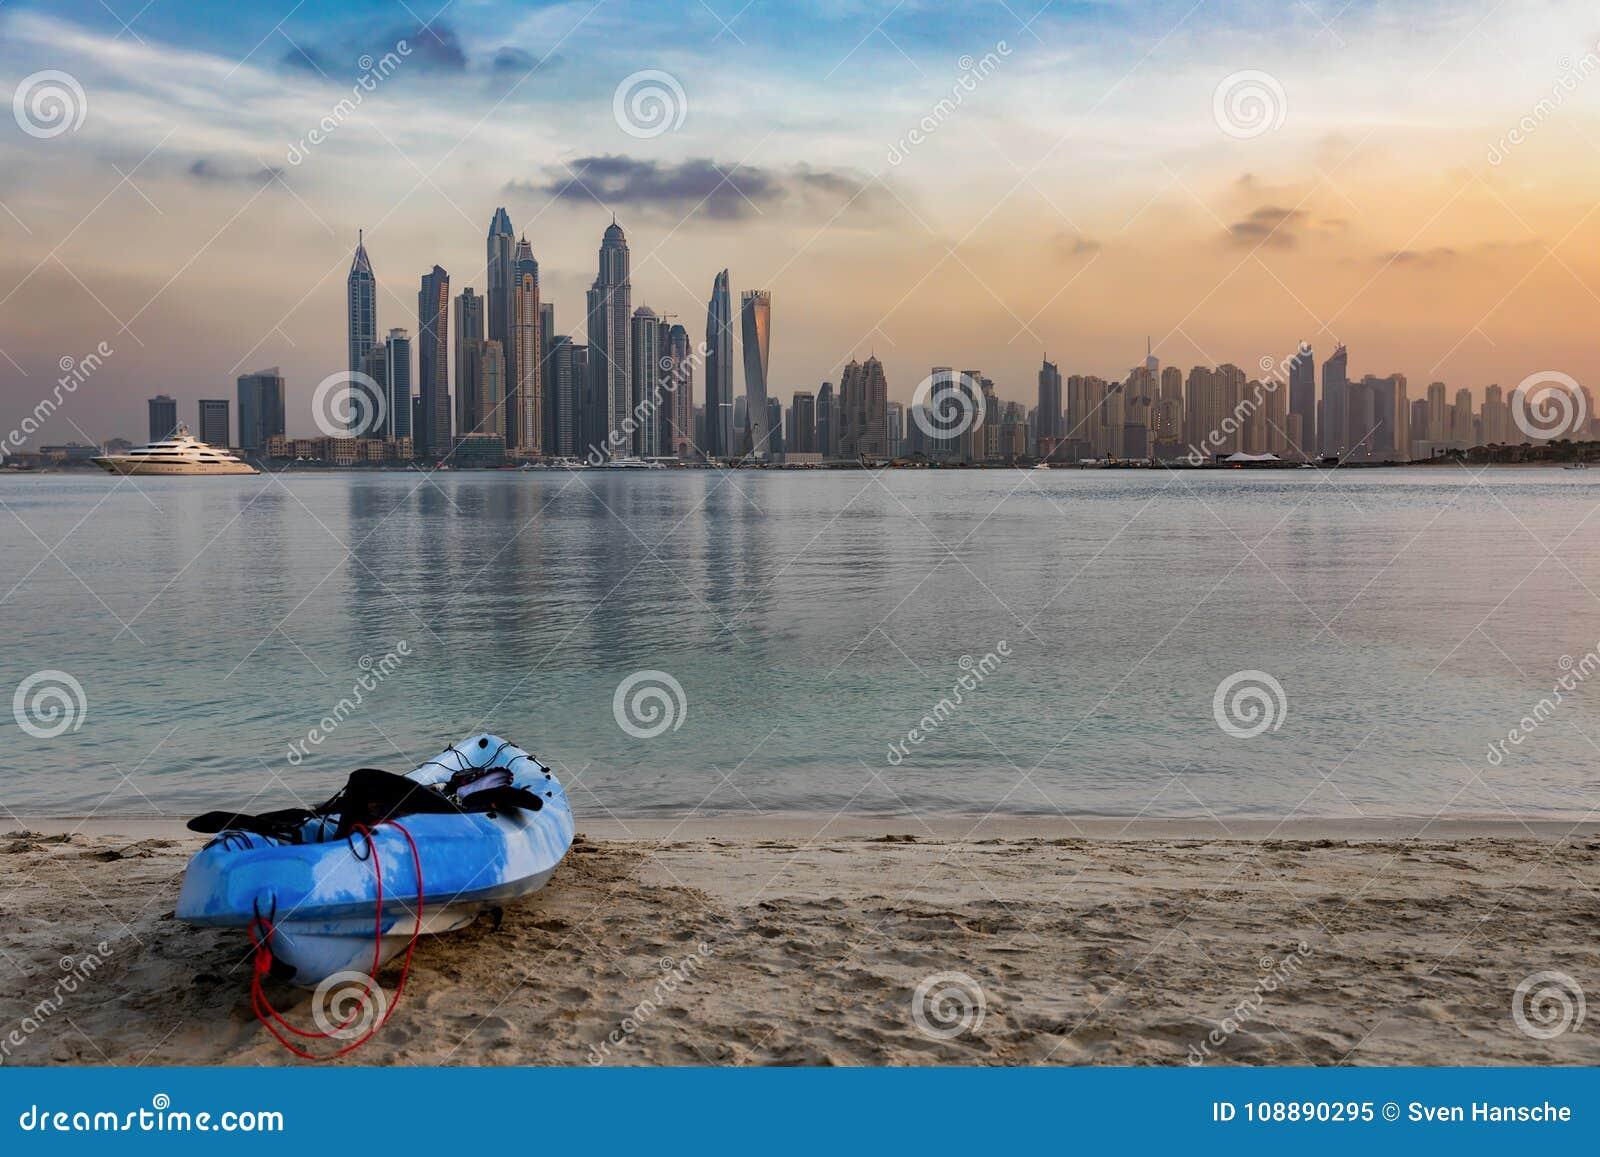 Canoe on the beach in front of the Dubai Marina